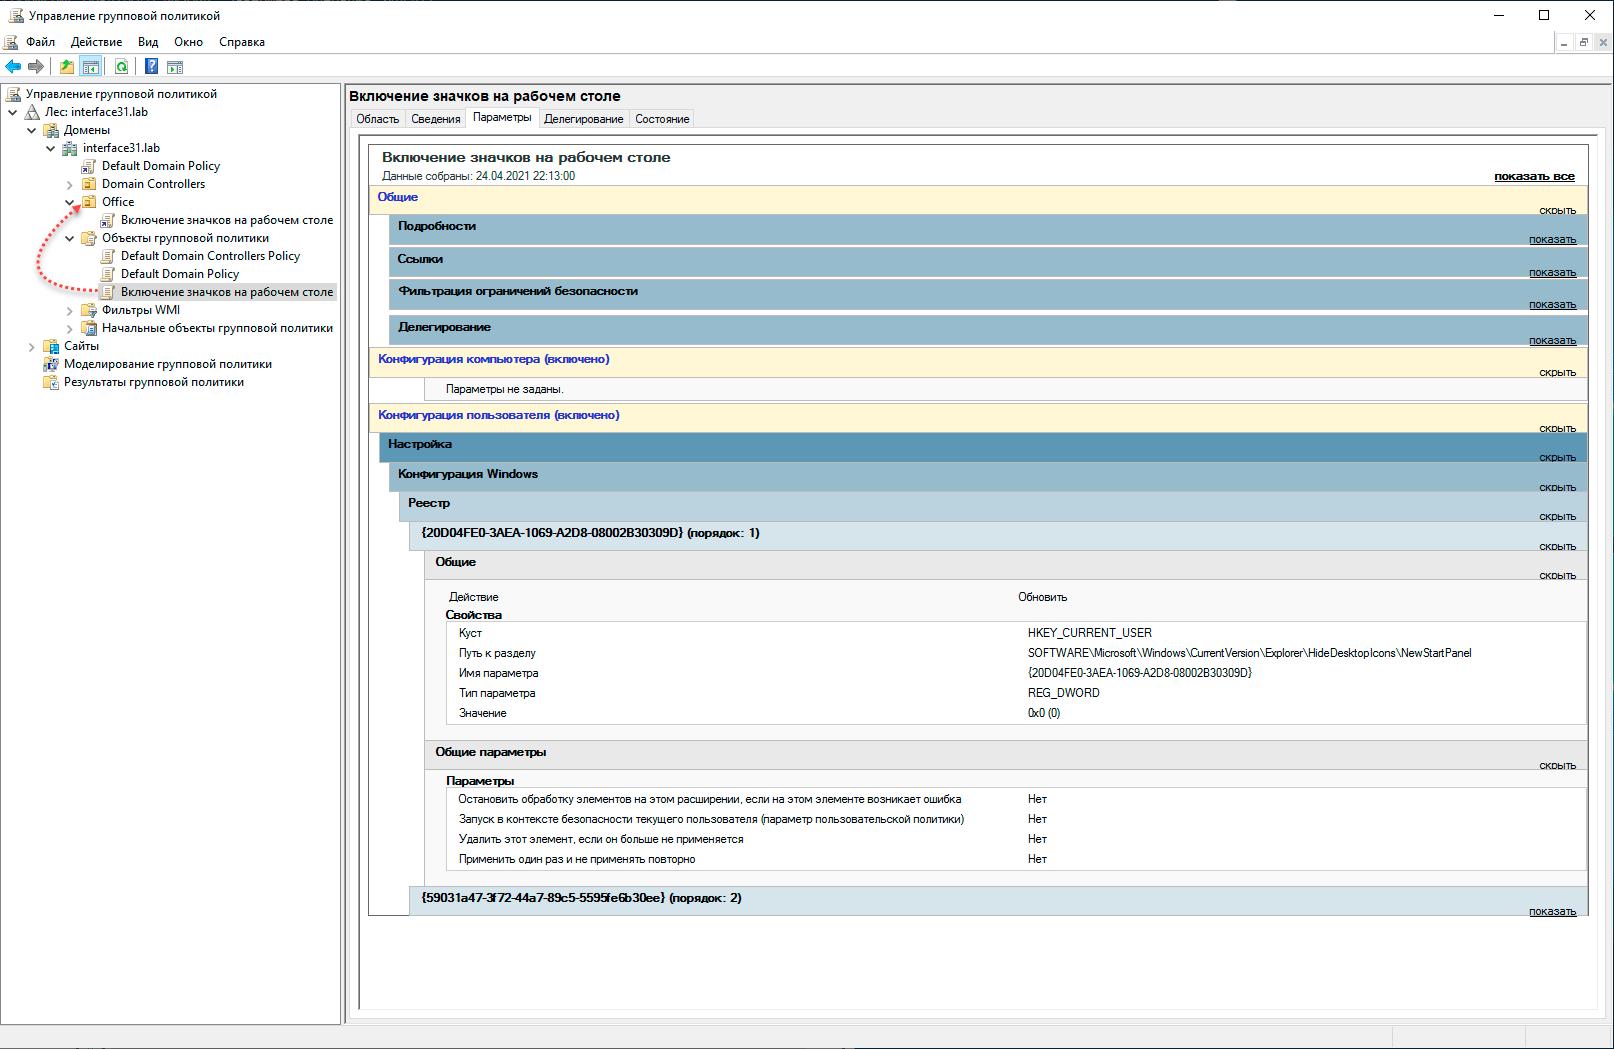 https://interface31.ru/tech_it/images/GPO-DesktopIcons-004.png